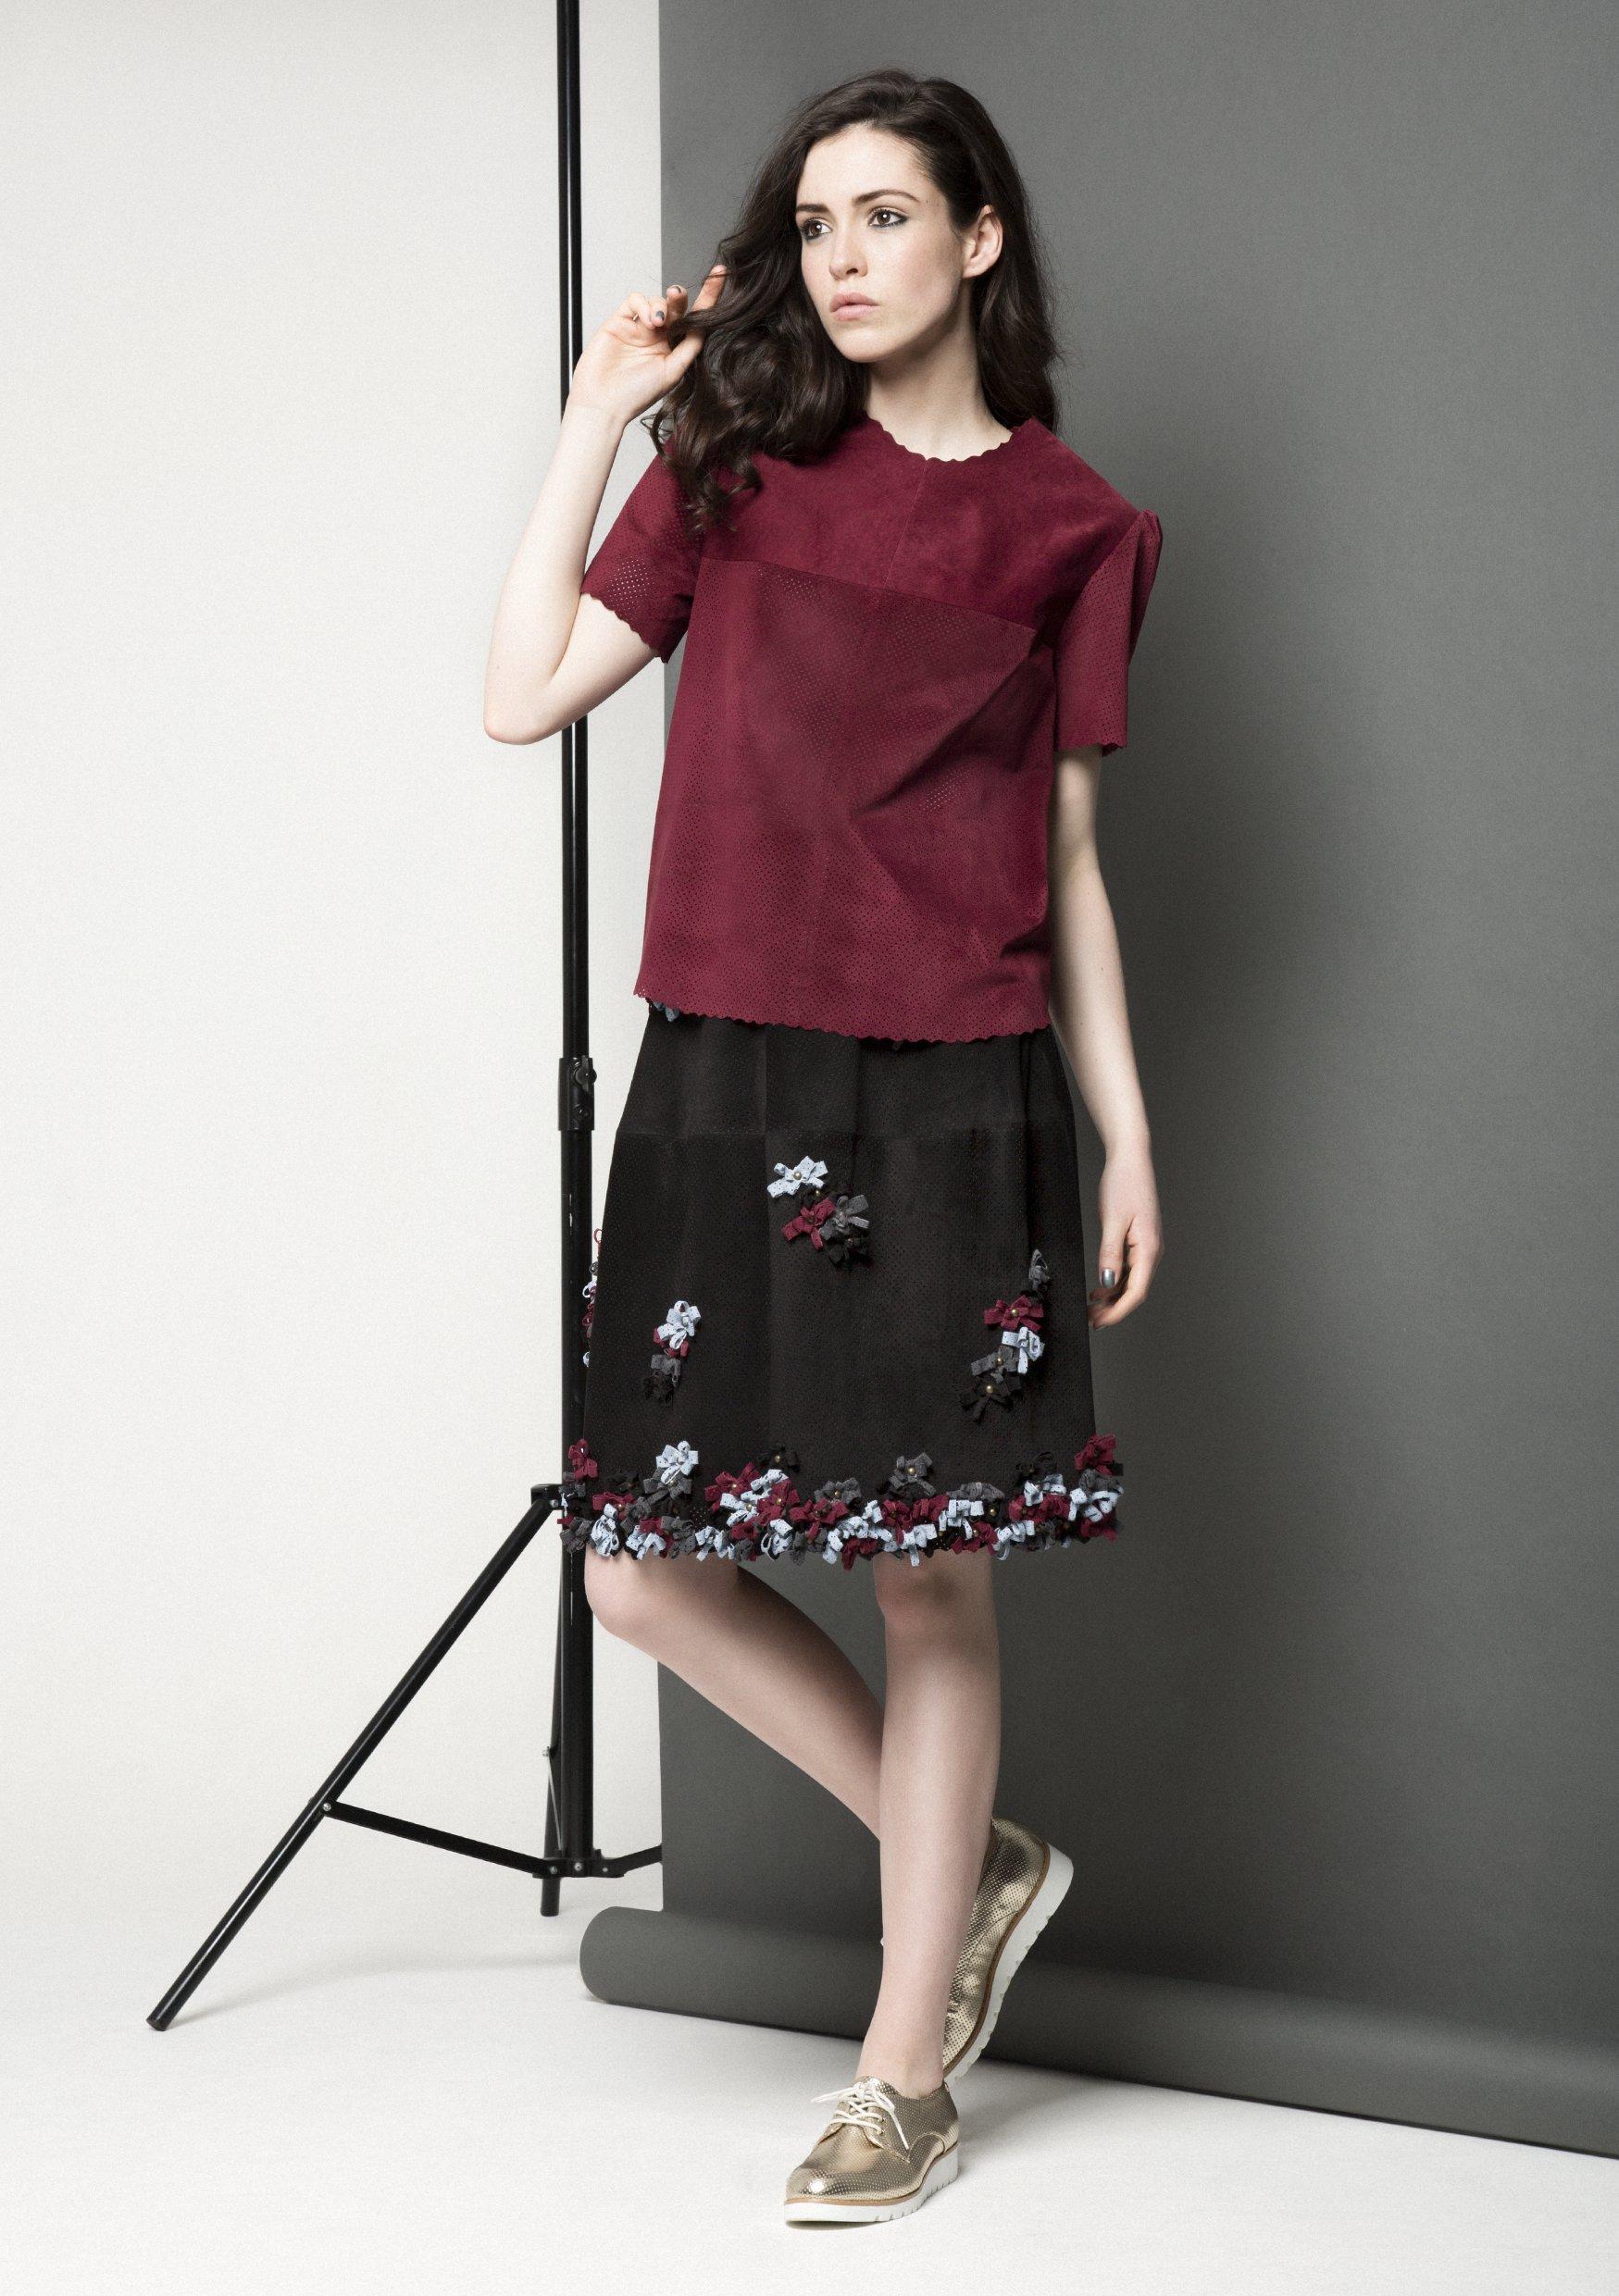 Manley AW15 Maya Leather Tee €220, Lexi Bow Skirt €399.jpg